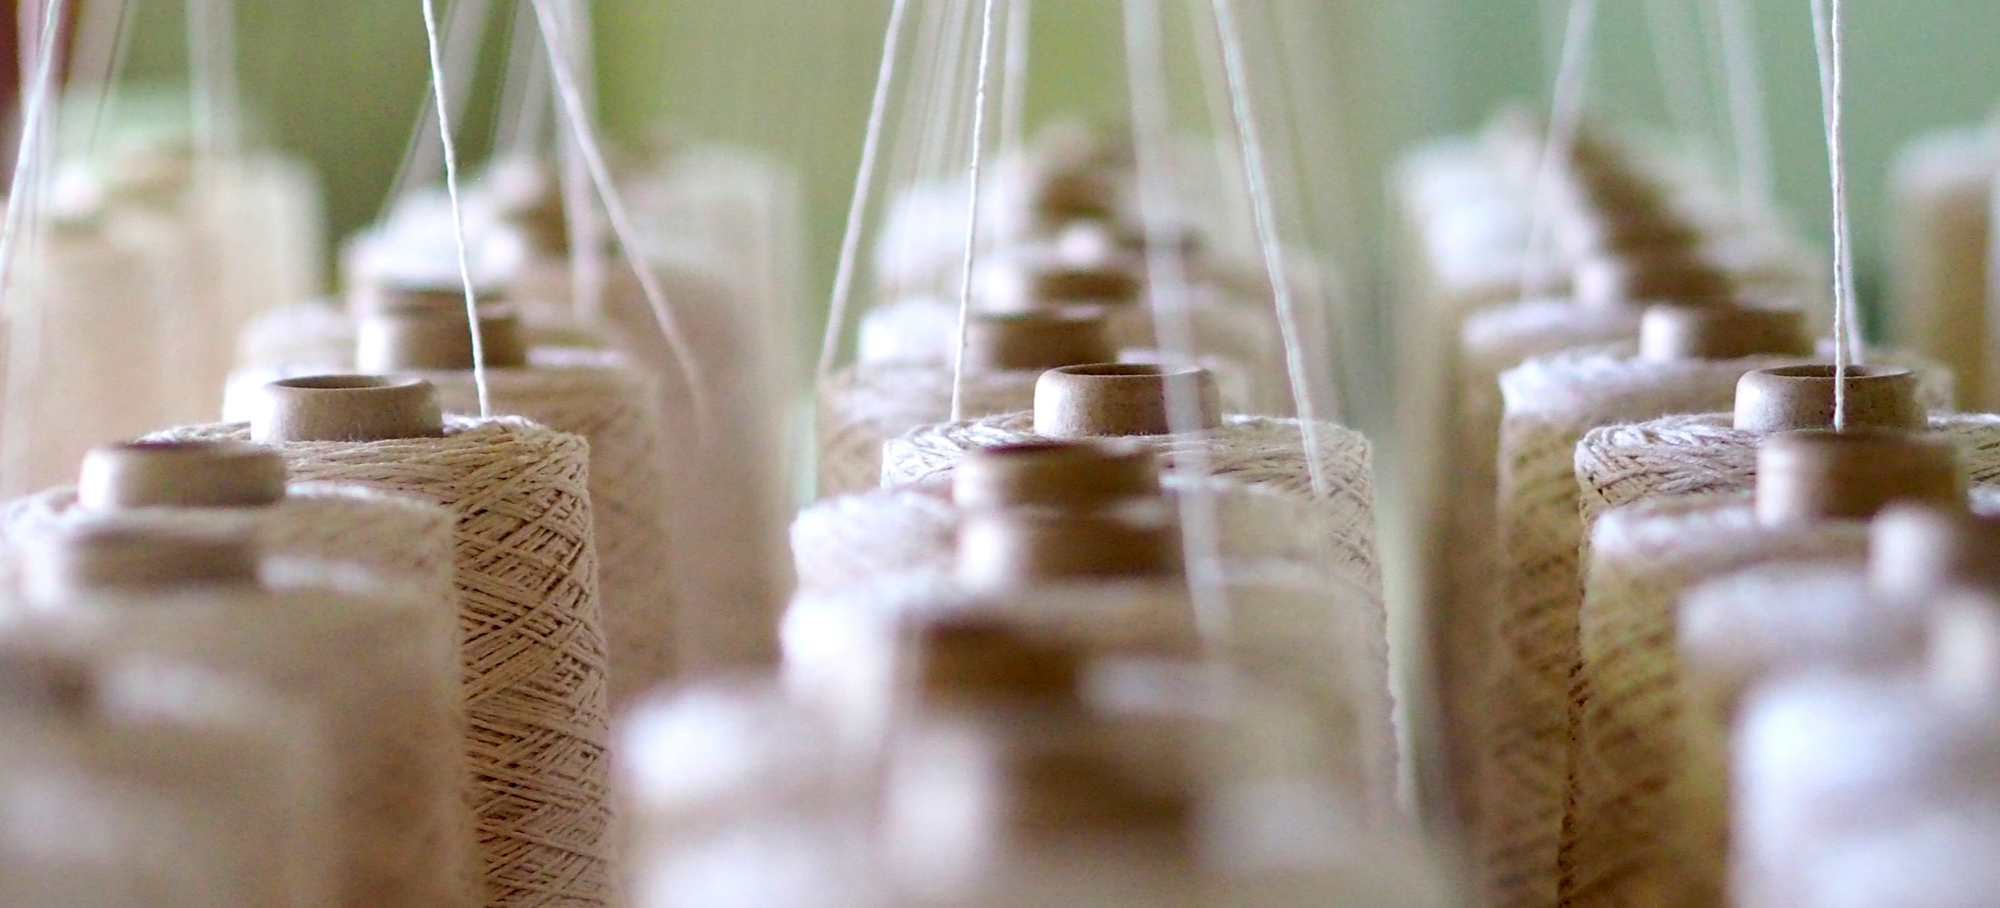 EU Legislation Update: The EU strategy for sustainable textiles